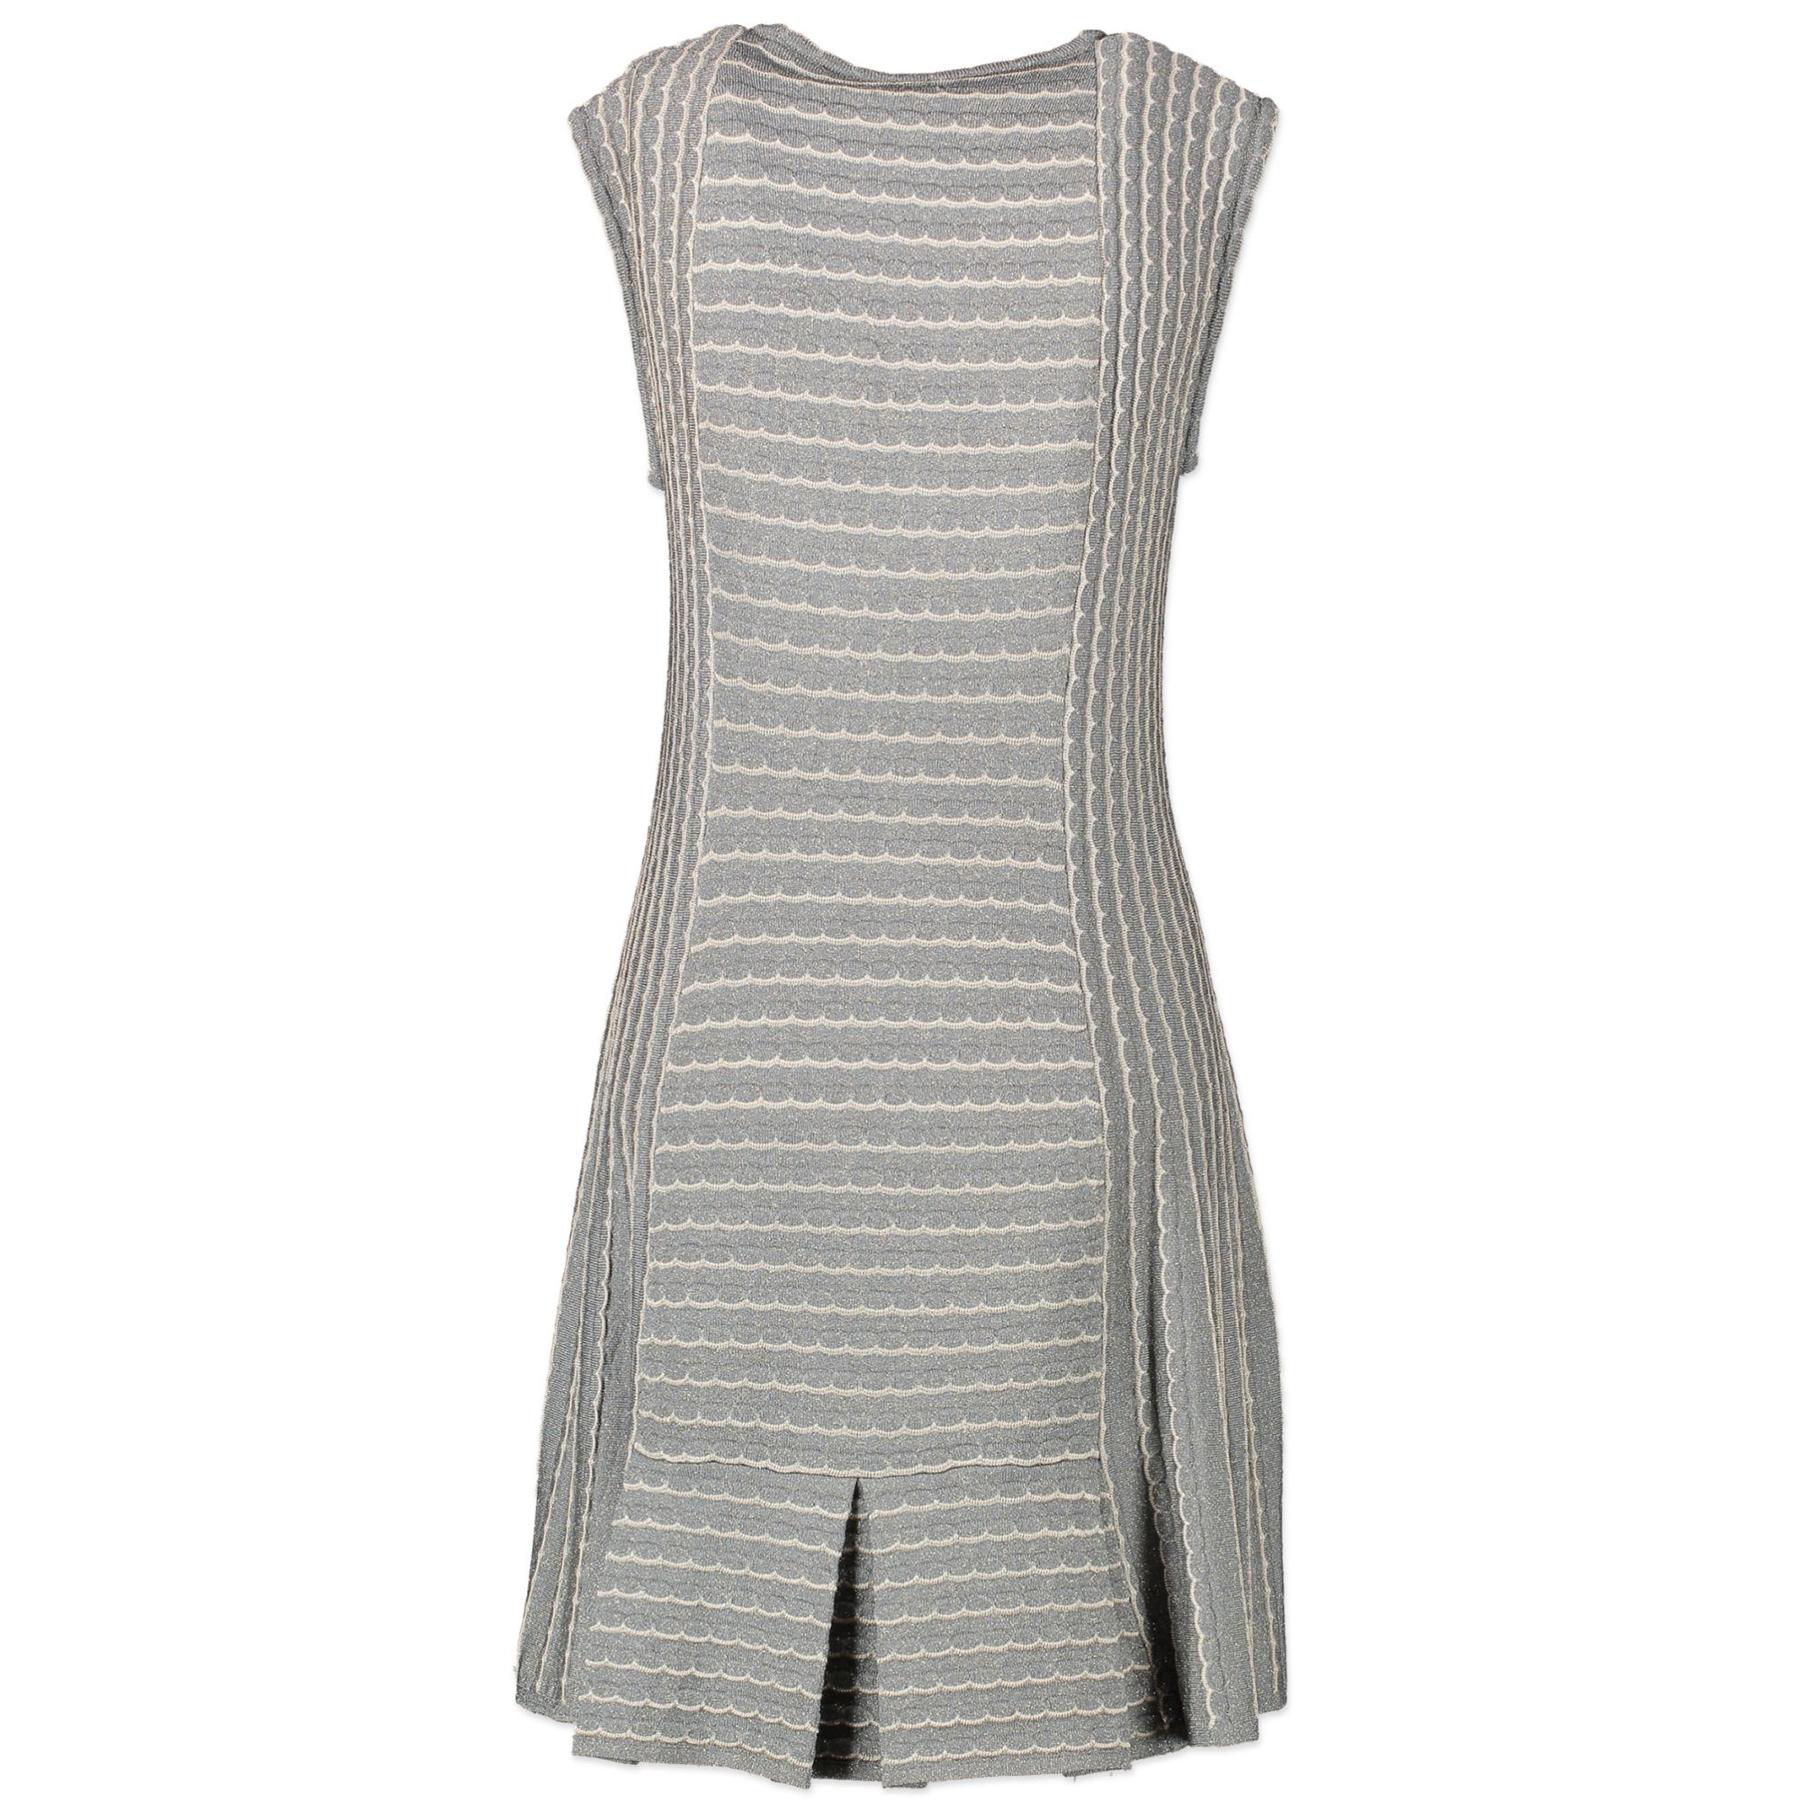 Authentieke Tweedehands M Missoni Wave Knit Sleeveless Dress - Size 44 juiste prijs veilig online shoppen luxe merken webshop winkelen Antwerpen België mode fashion